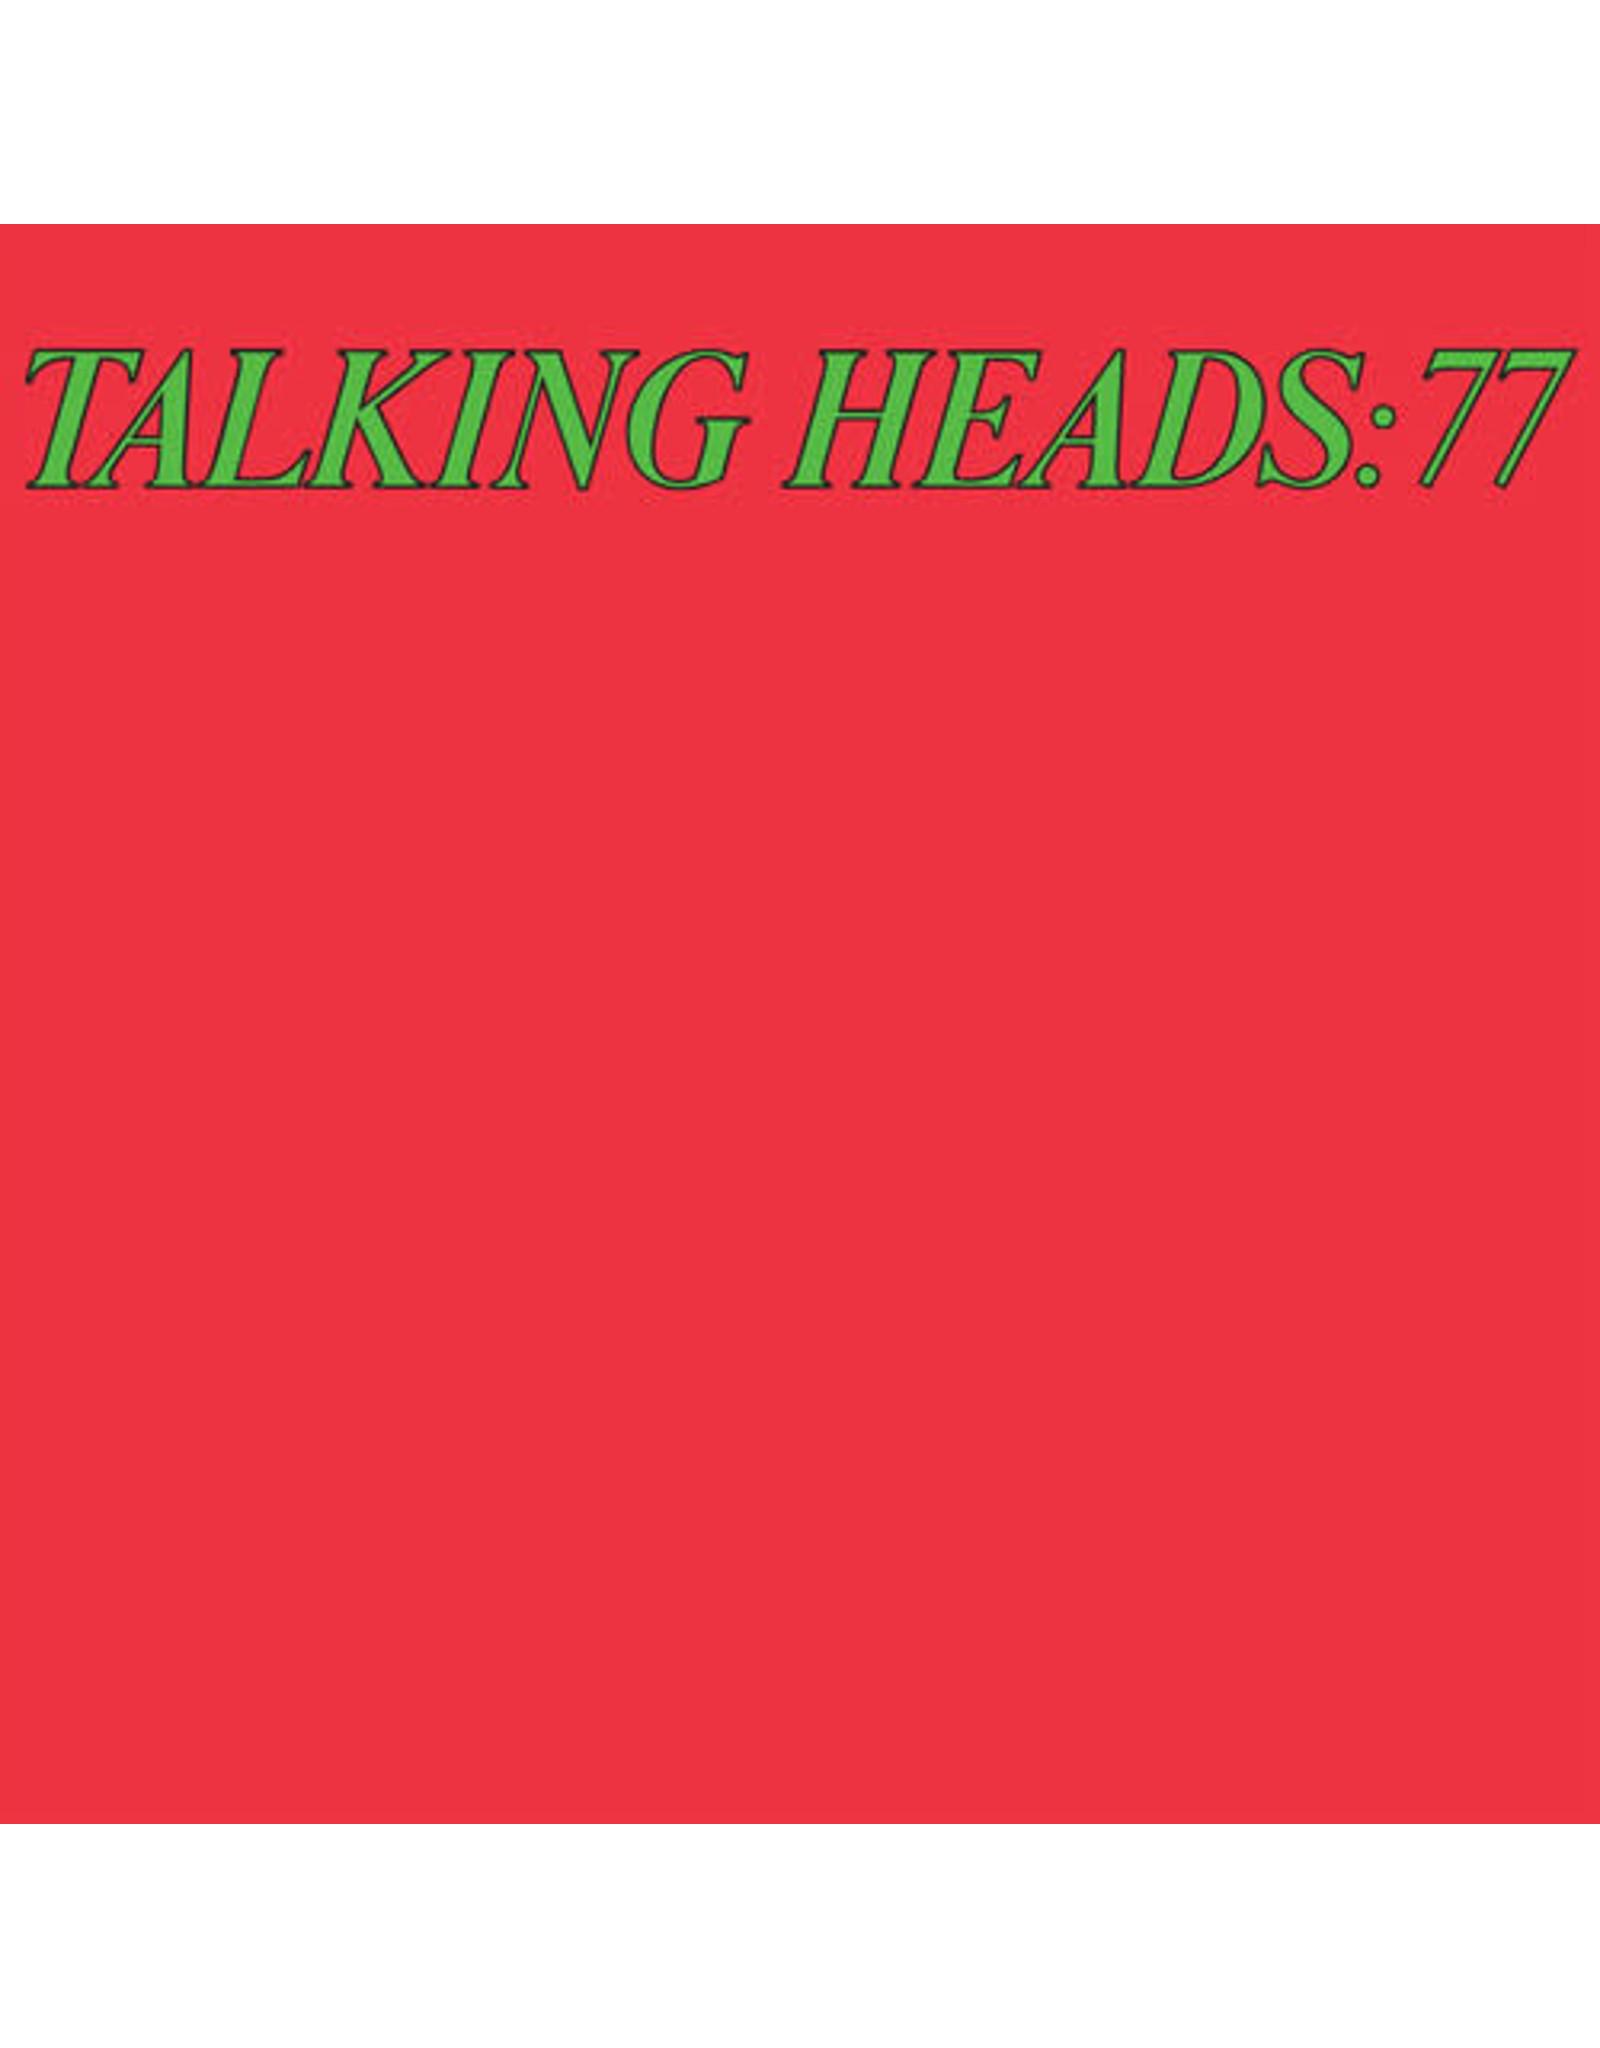 New Vinyl Talking Heads - Talking Heads: 77 (Colored) LP